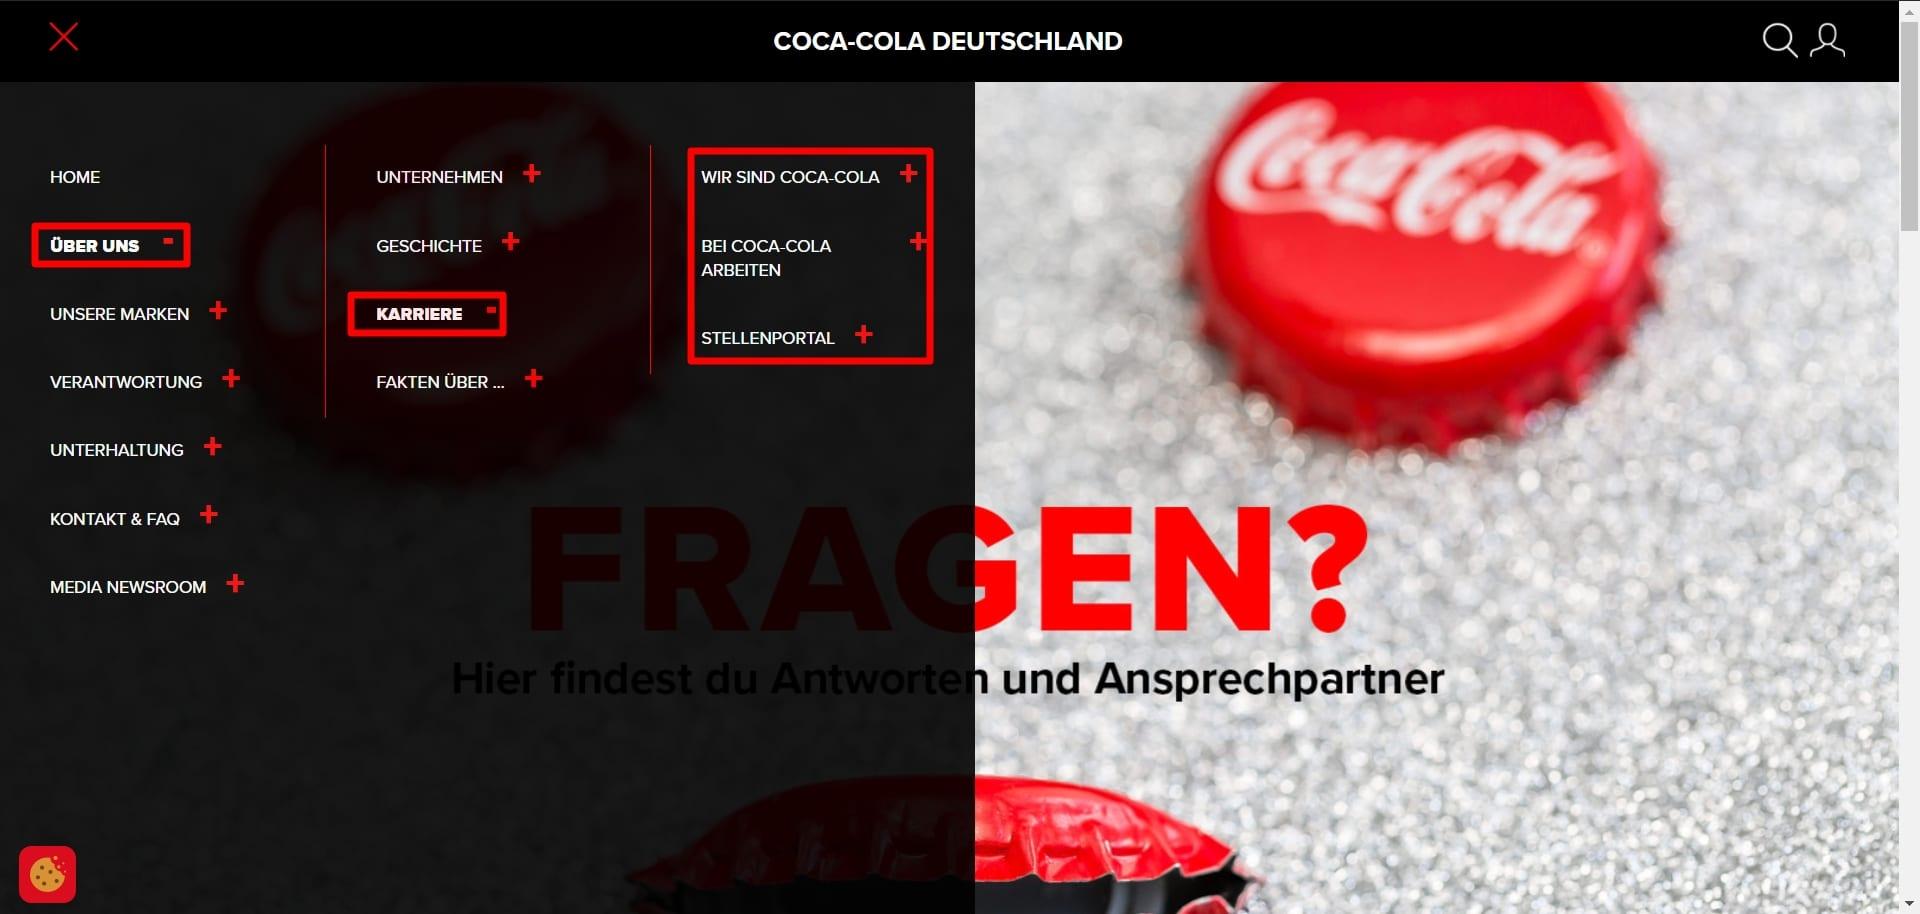 Coca-Cola beherrscht auch Baustein 3 der perfekten Bewerbervermeidungsstrategie